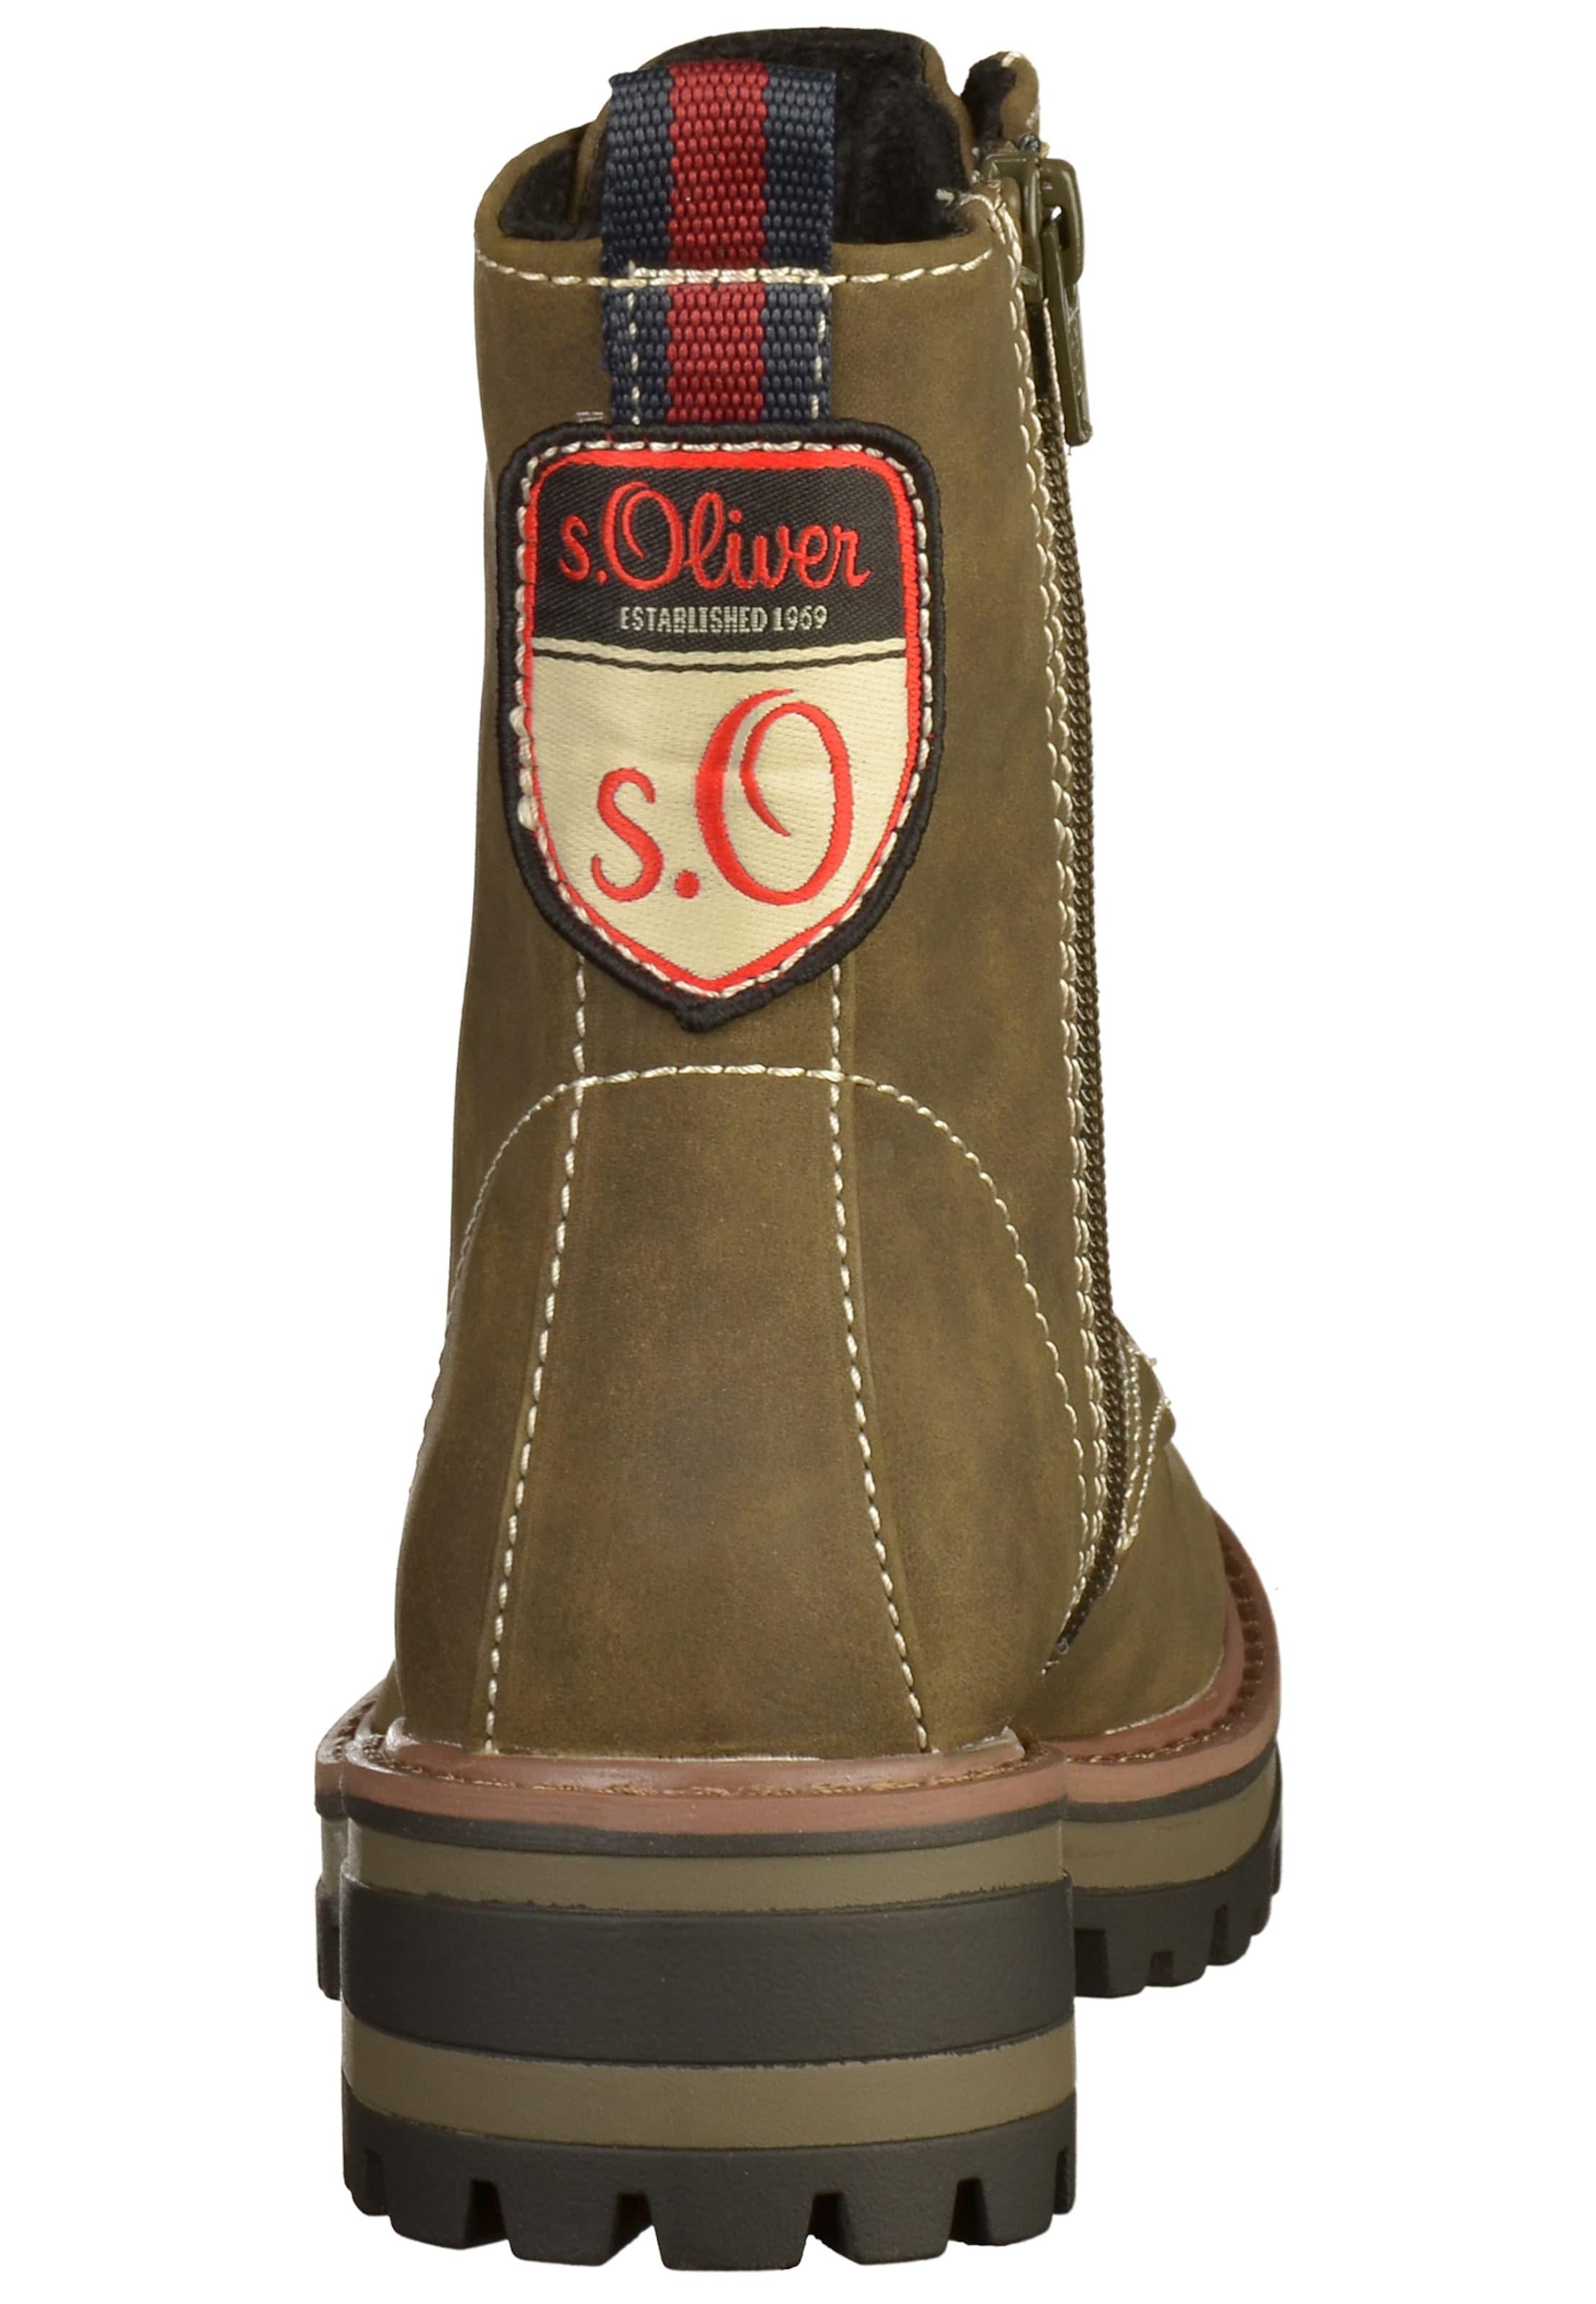 BraunOliv Stiefelette S In Label oliver Red 4qcRS3Aj5L